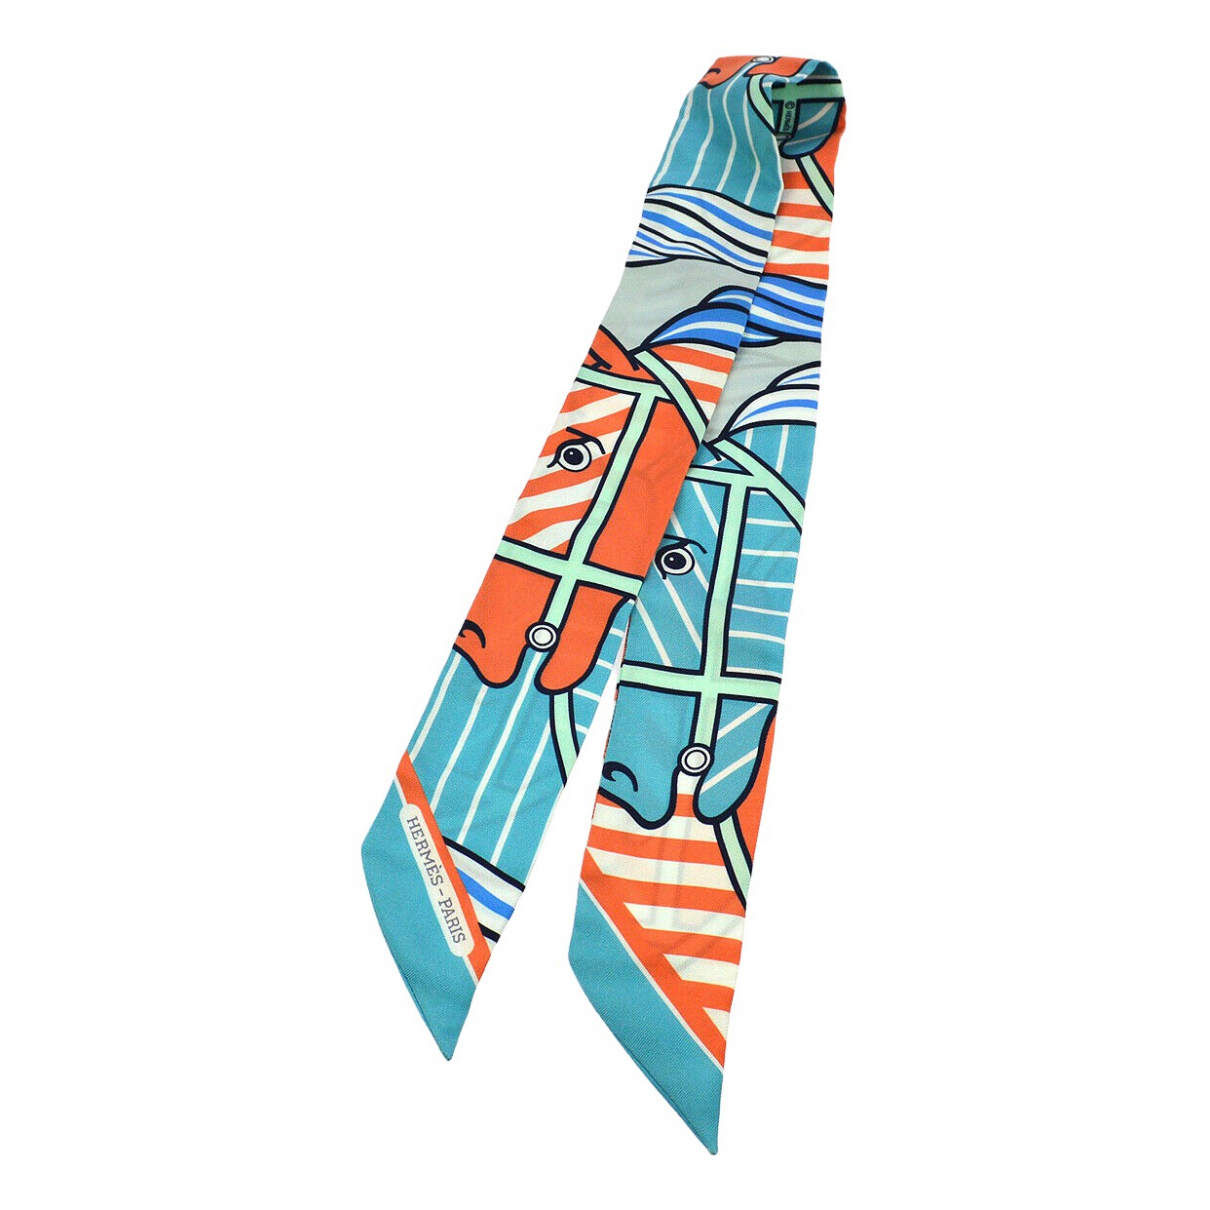 Hermes - Foulard Twilly 86 pour femme en soie - bleu